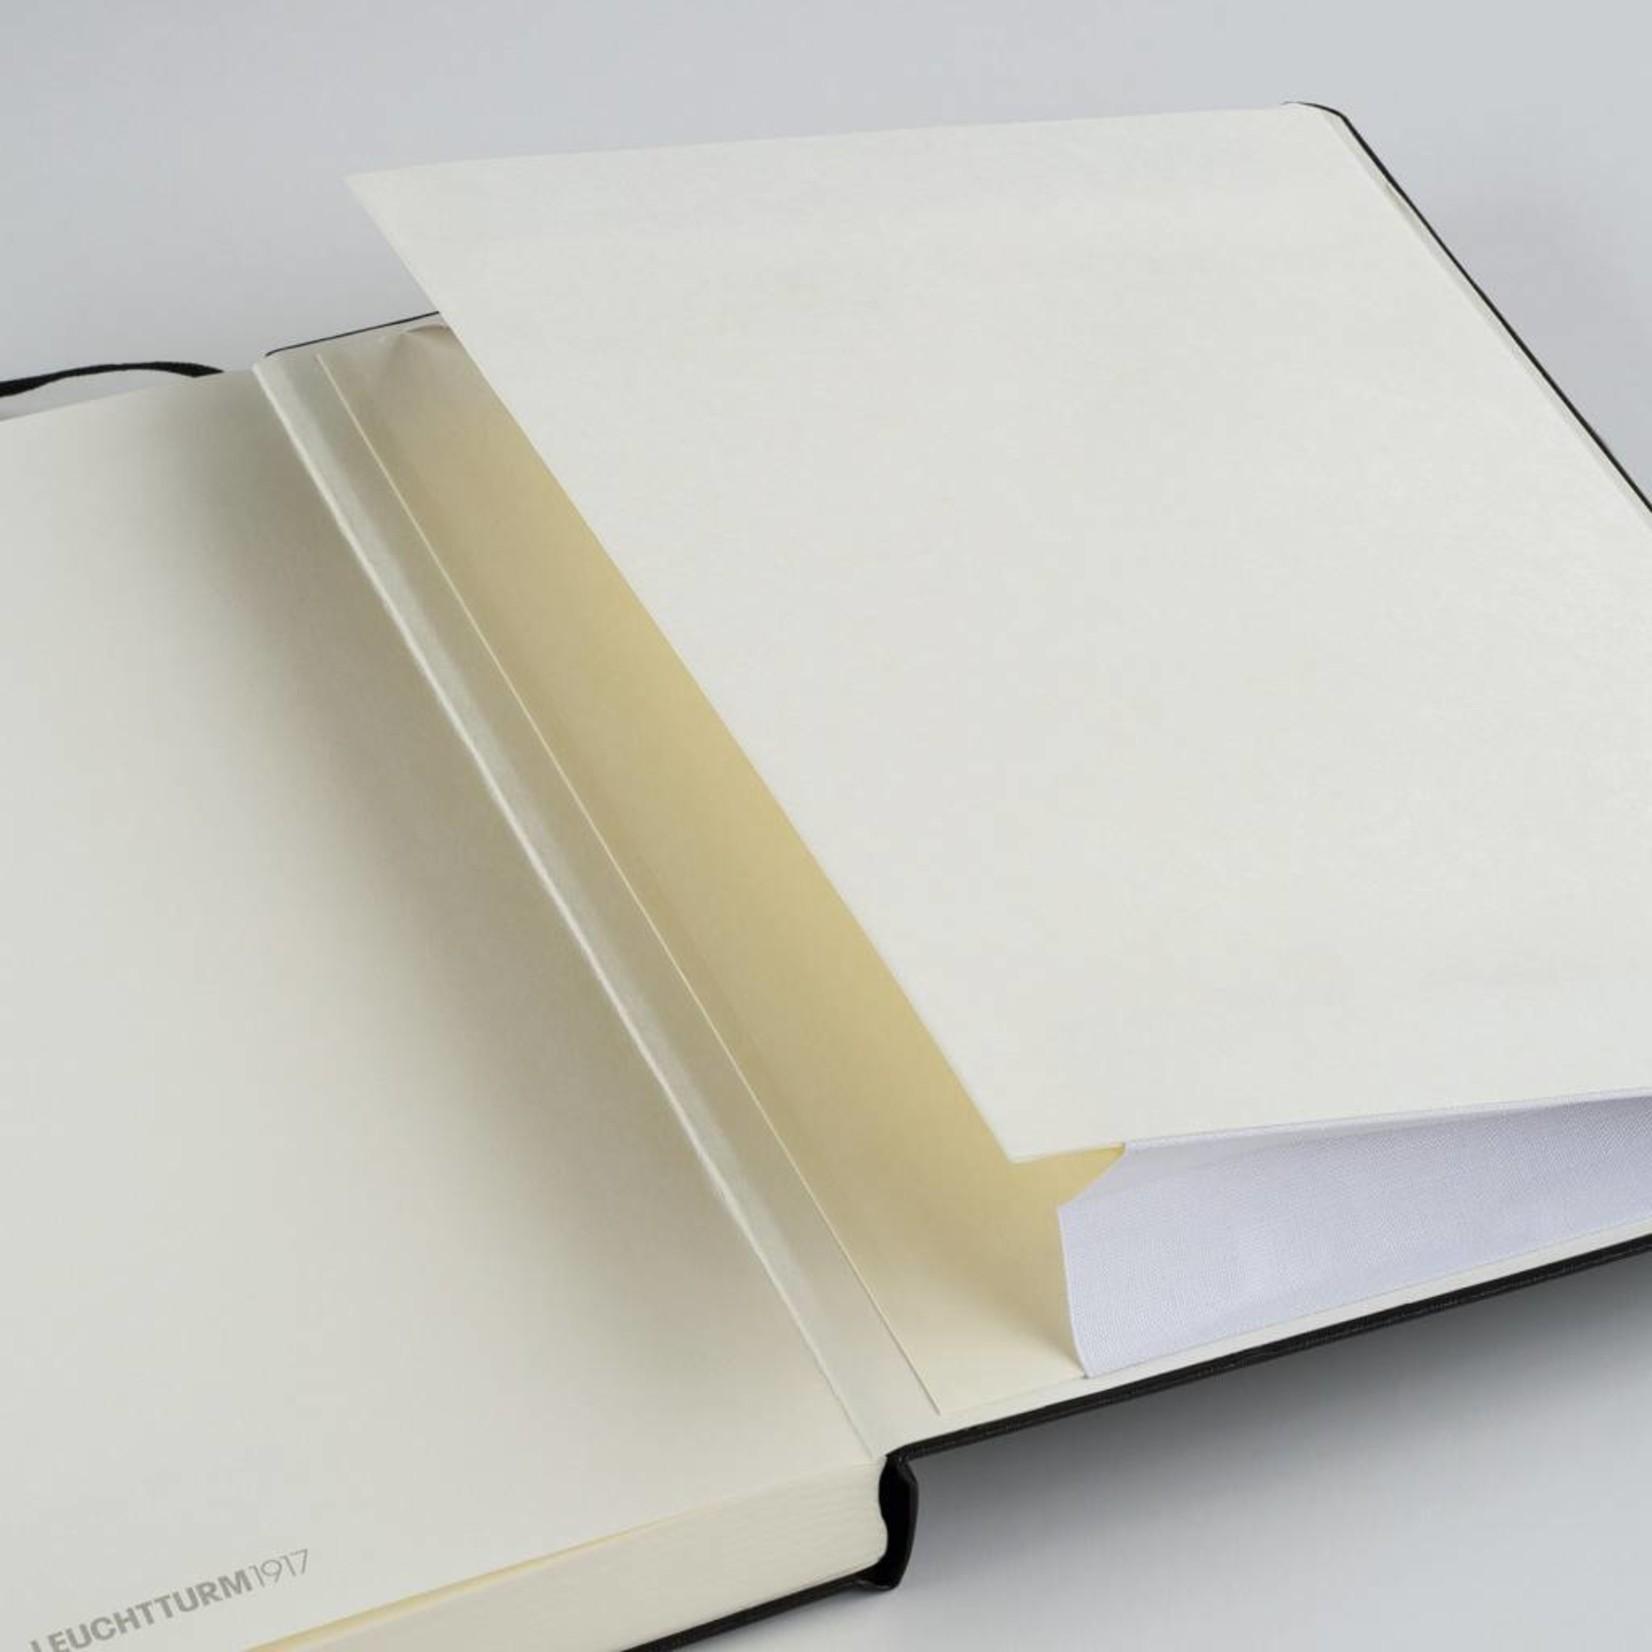 Leuchtturm1917 Leuchtturm1917 Notizbuch Softcover, Medium, Schwarz, Kariert